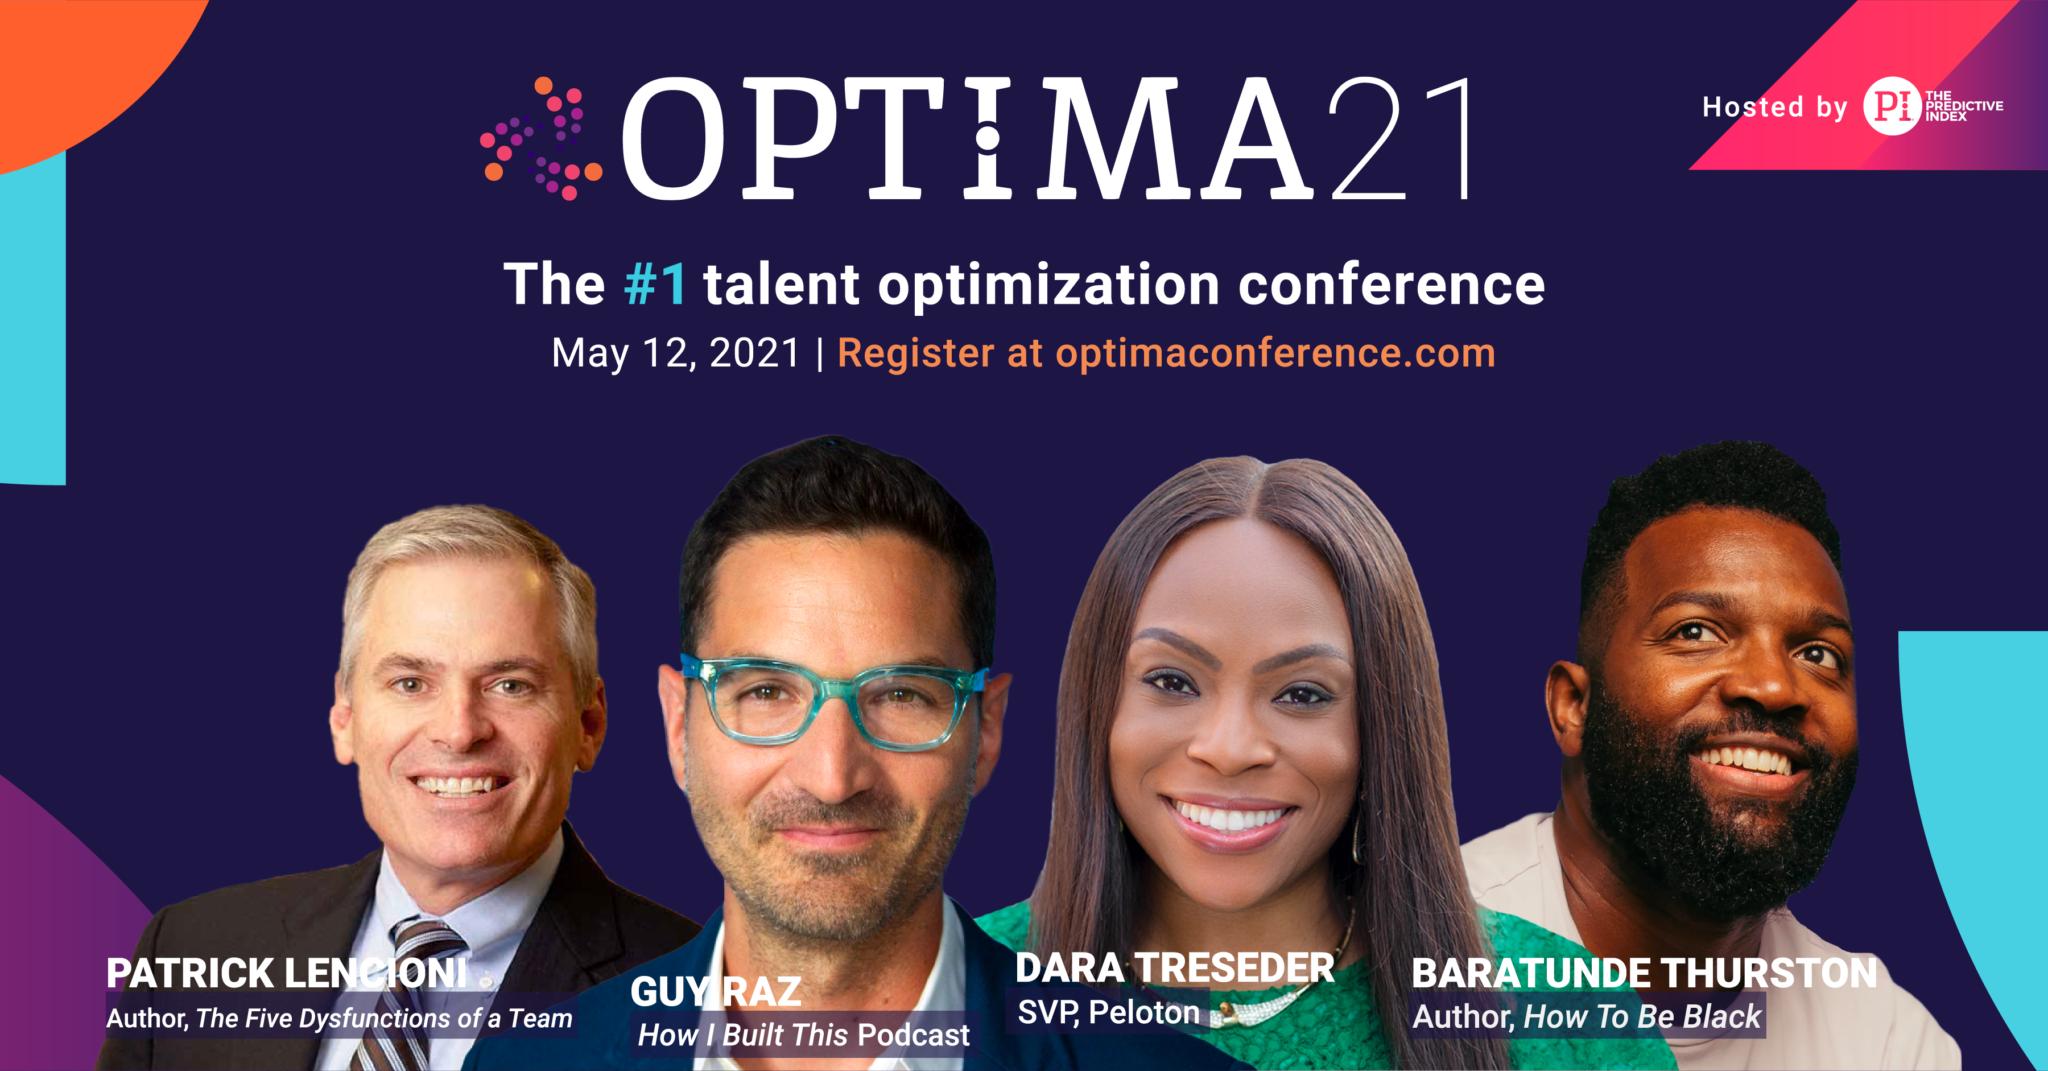 OPTIMA21 speaker lineup